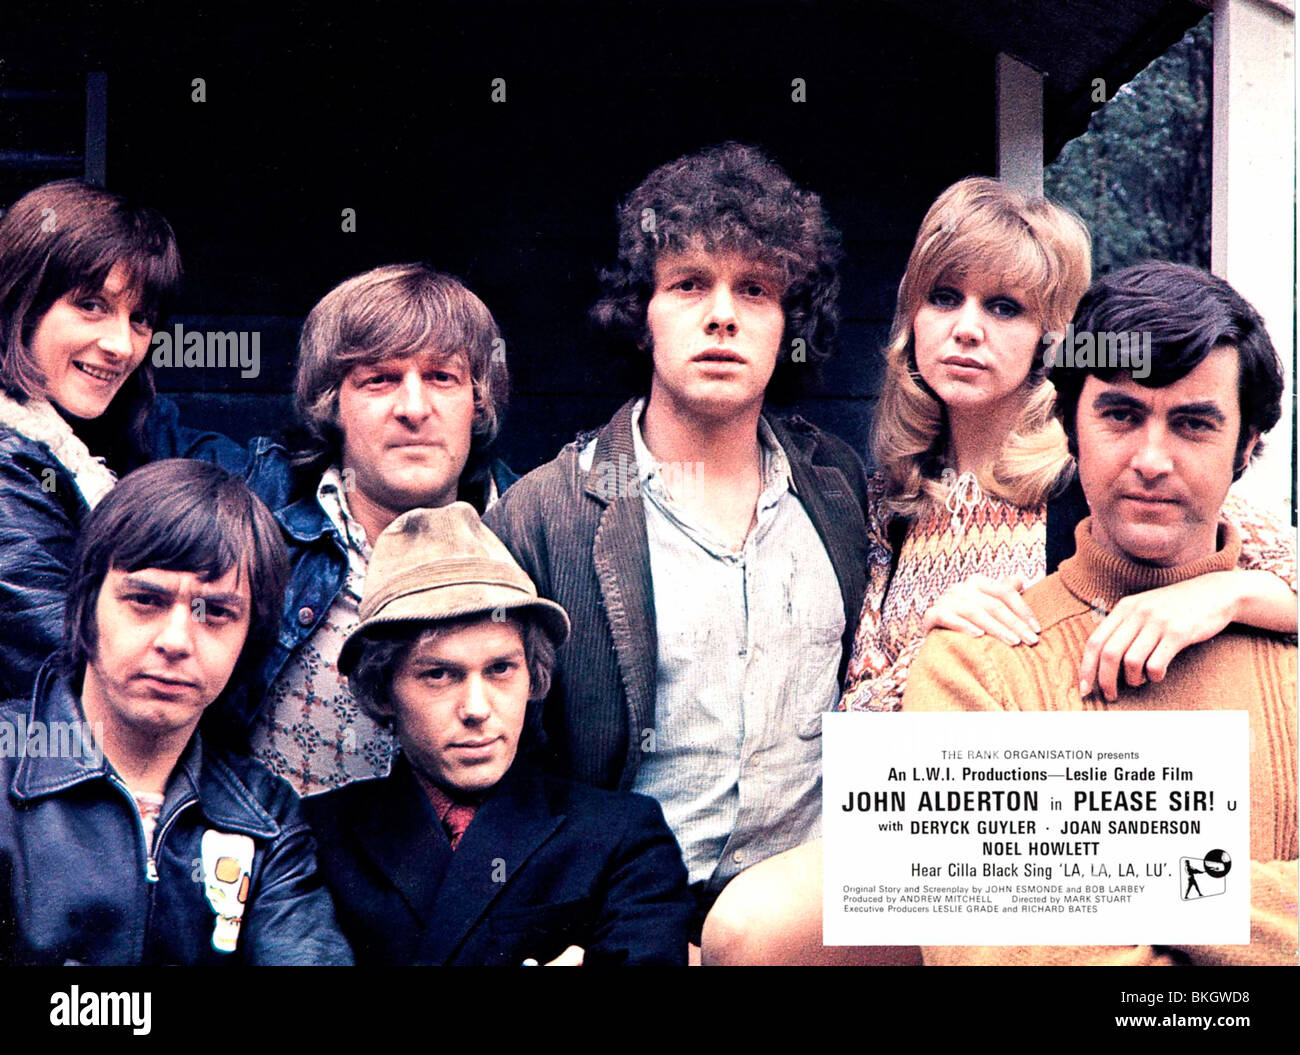 PLEASE SIR! (1971) PLEASE SIR (ALT) JOHN ALDERTON, CAROL HAWKINS, MARK STUART (DIR) PSIR 001 FOH - Stock Image